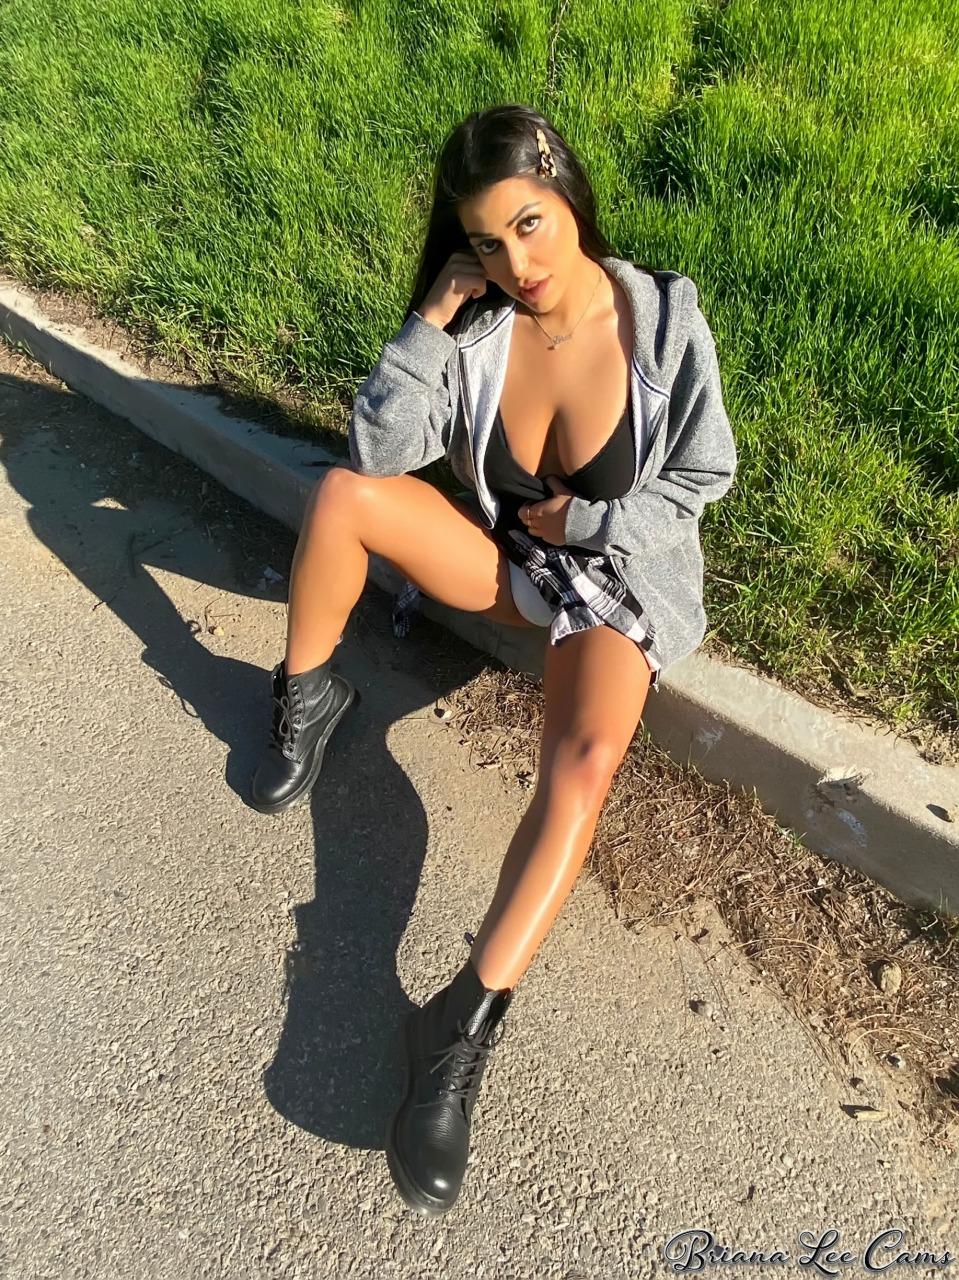 Briana Lee - Public Nudity 1